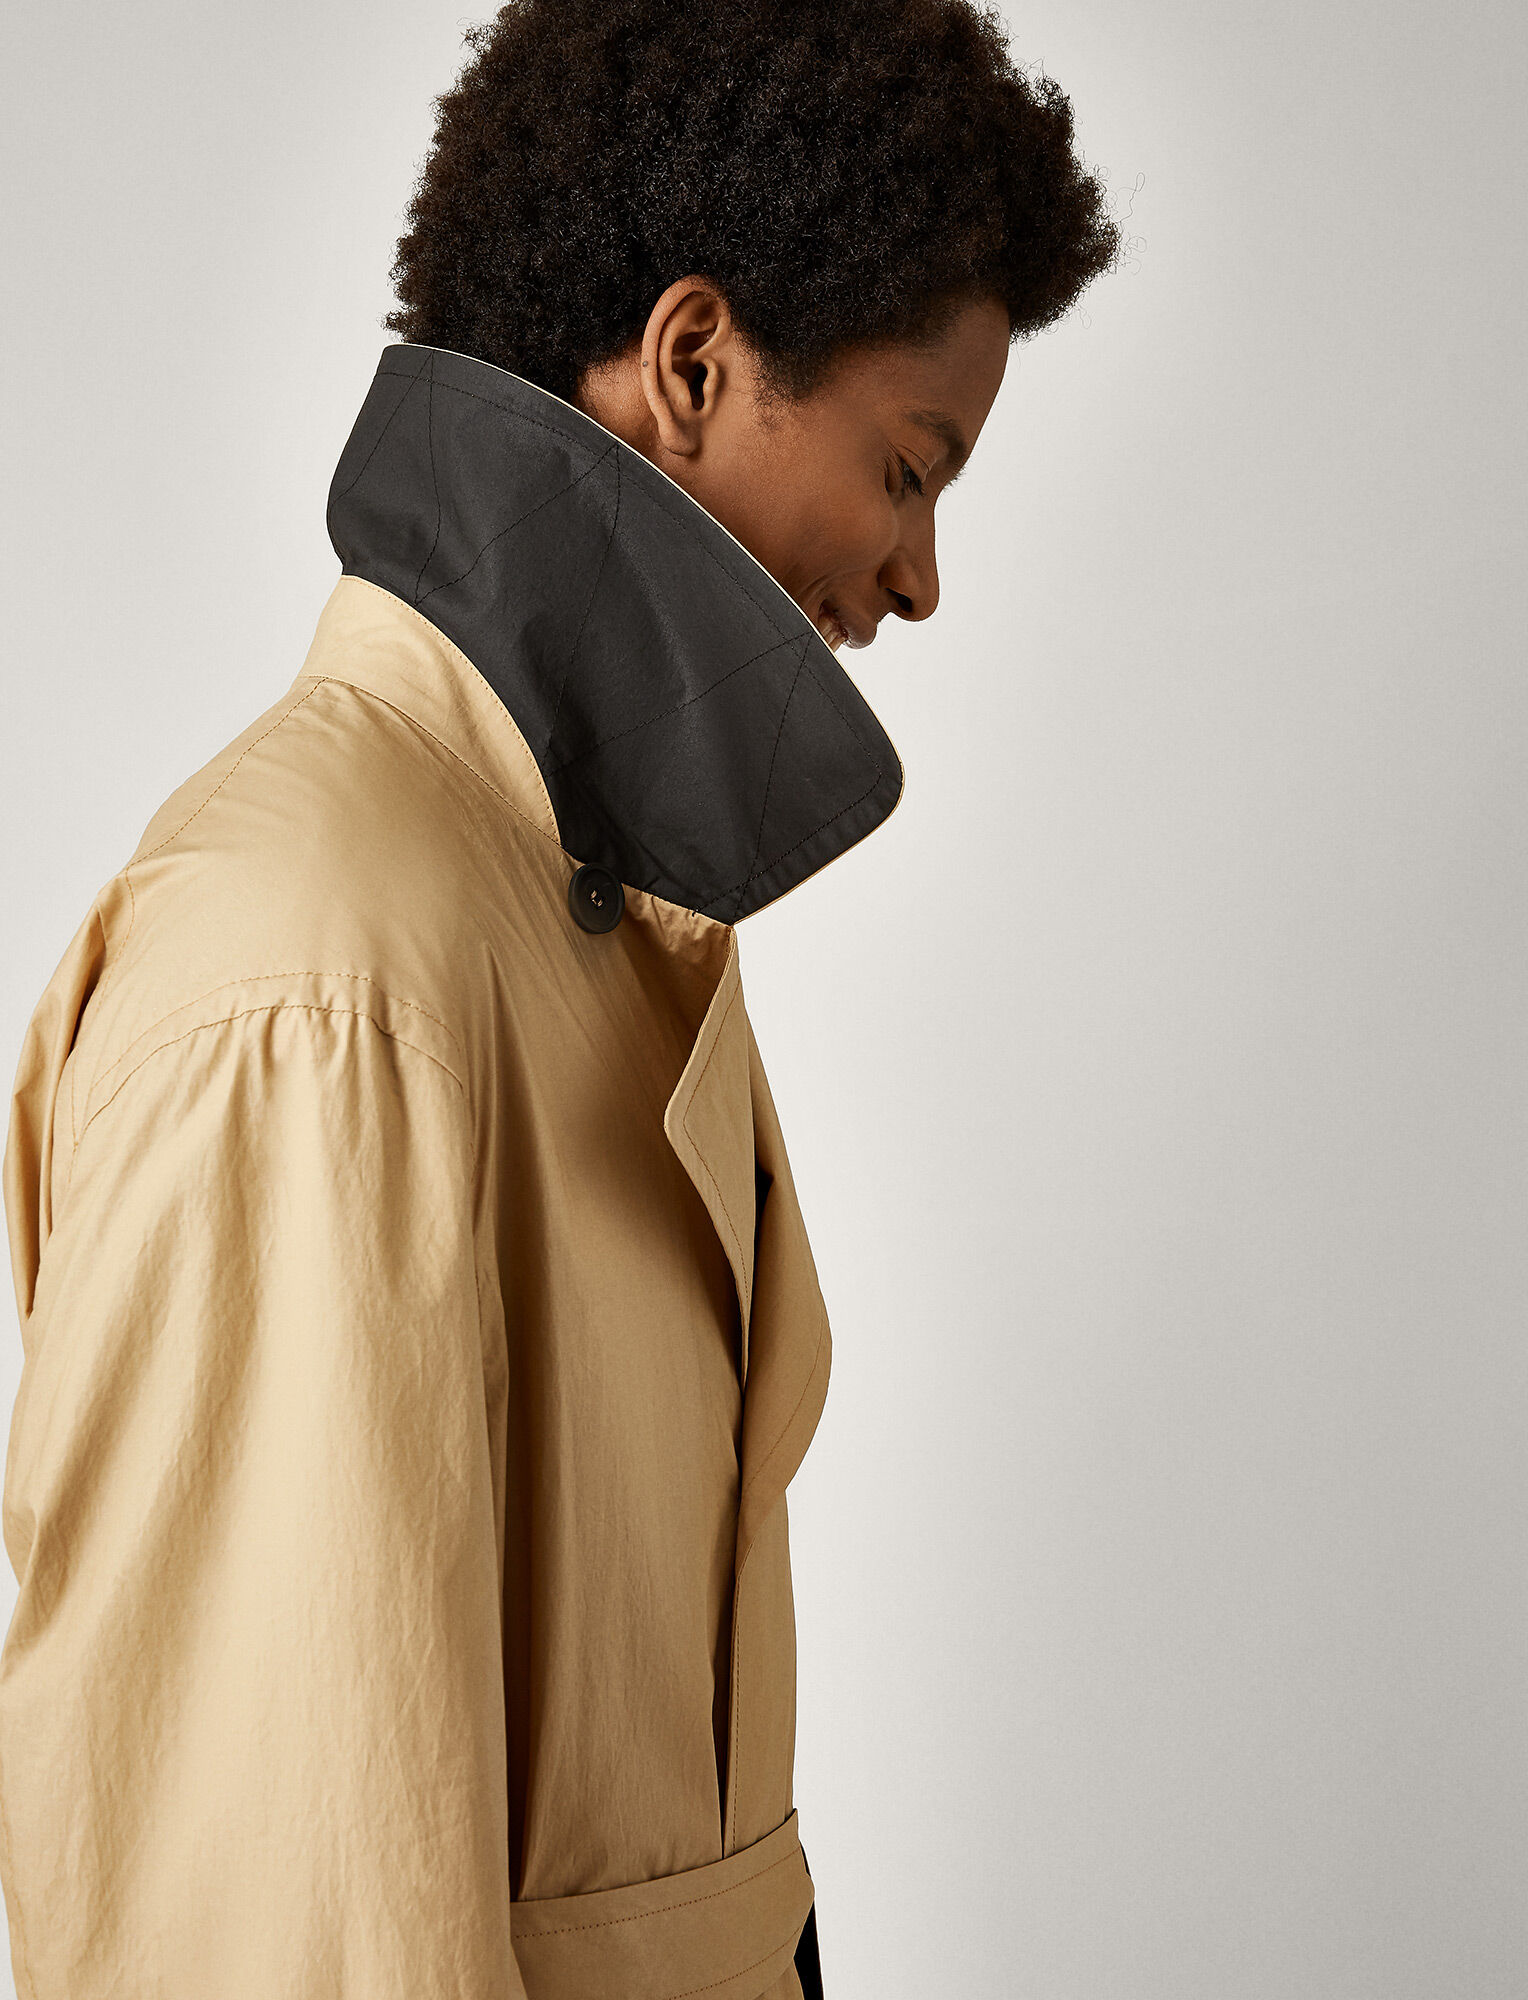 Joseph, Mawes Poplin Coated Coat, in CAMEL COMBO